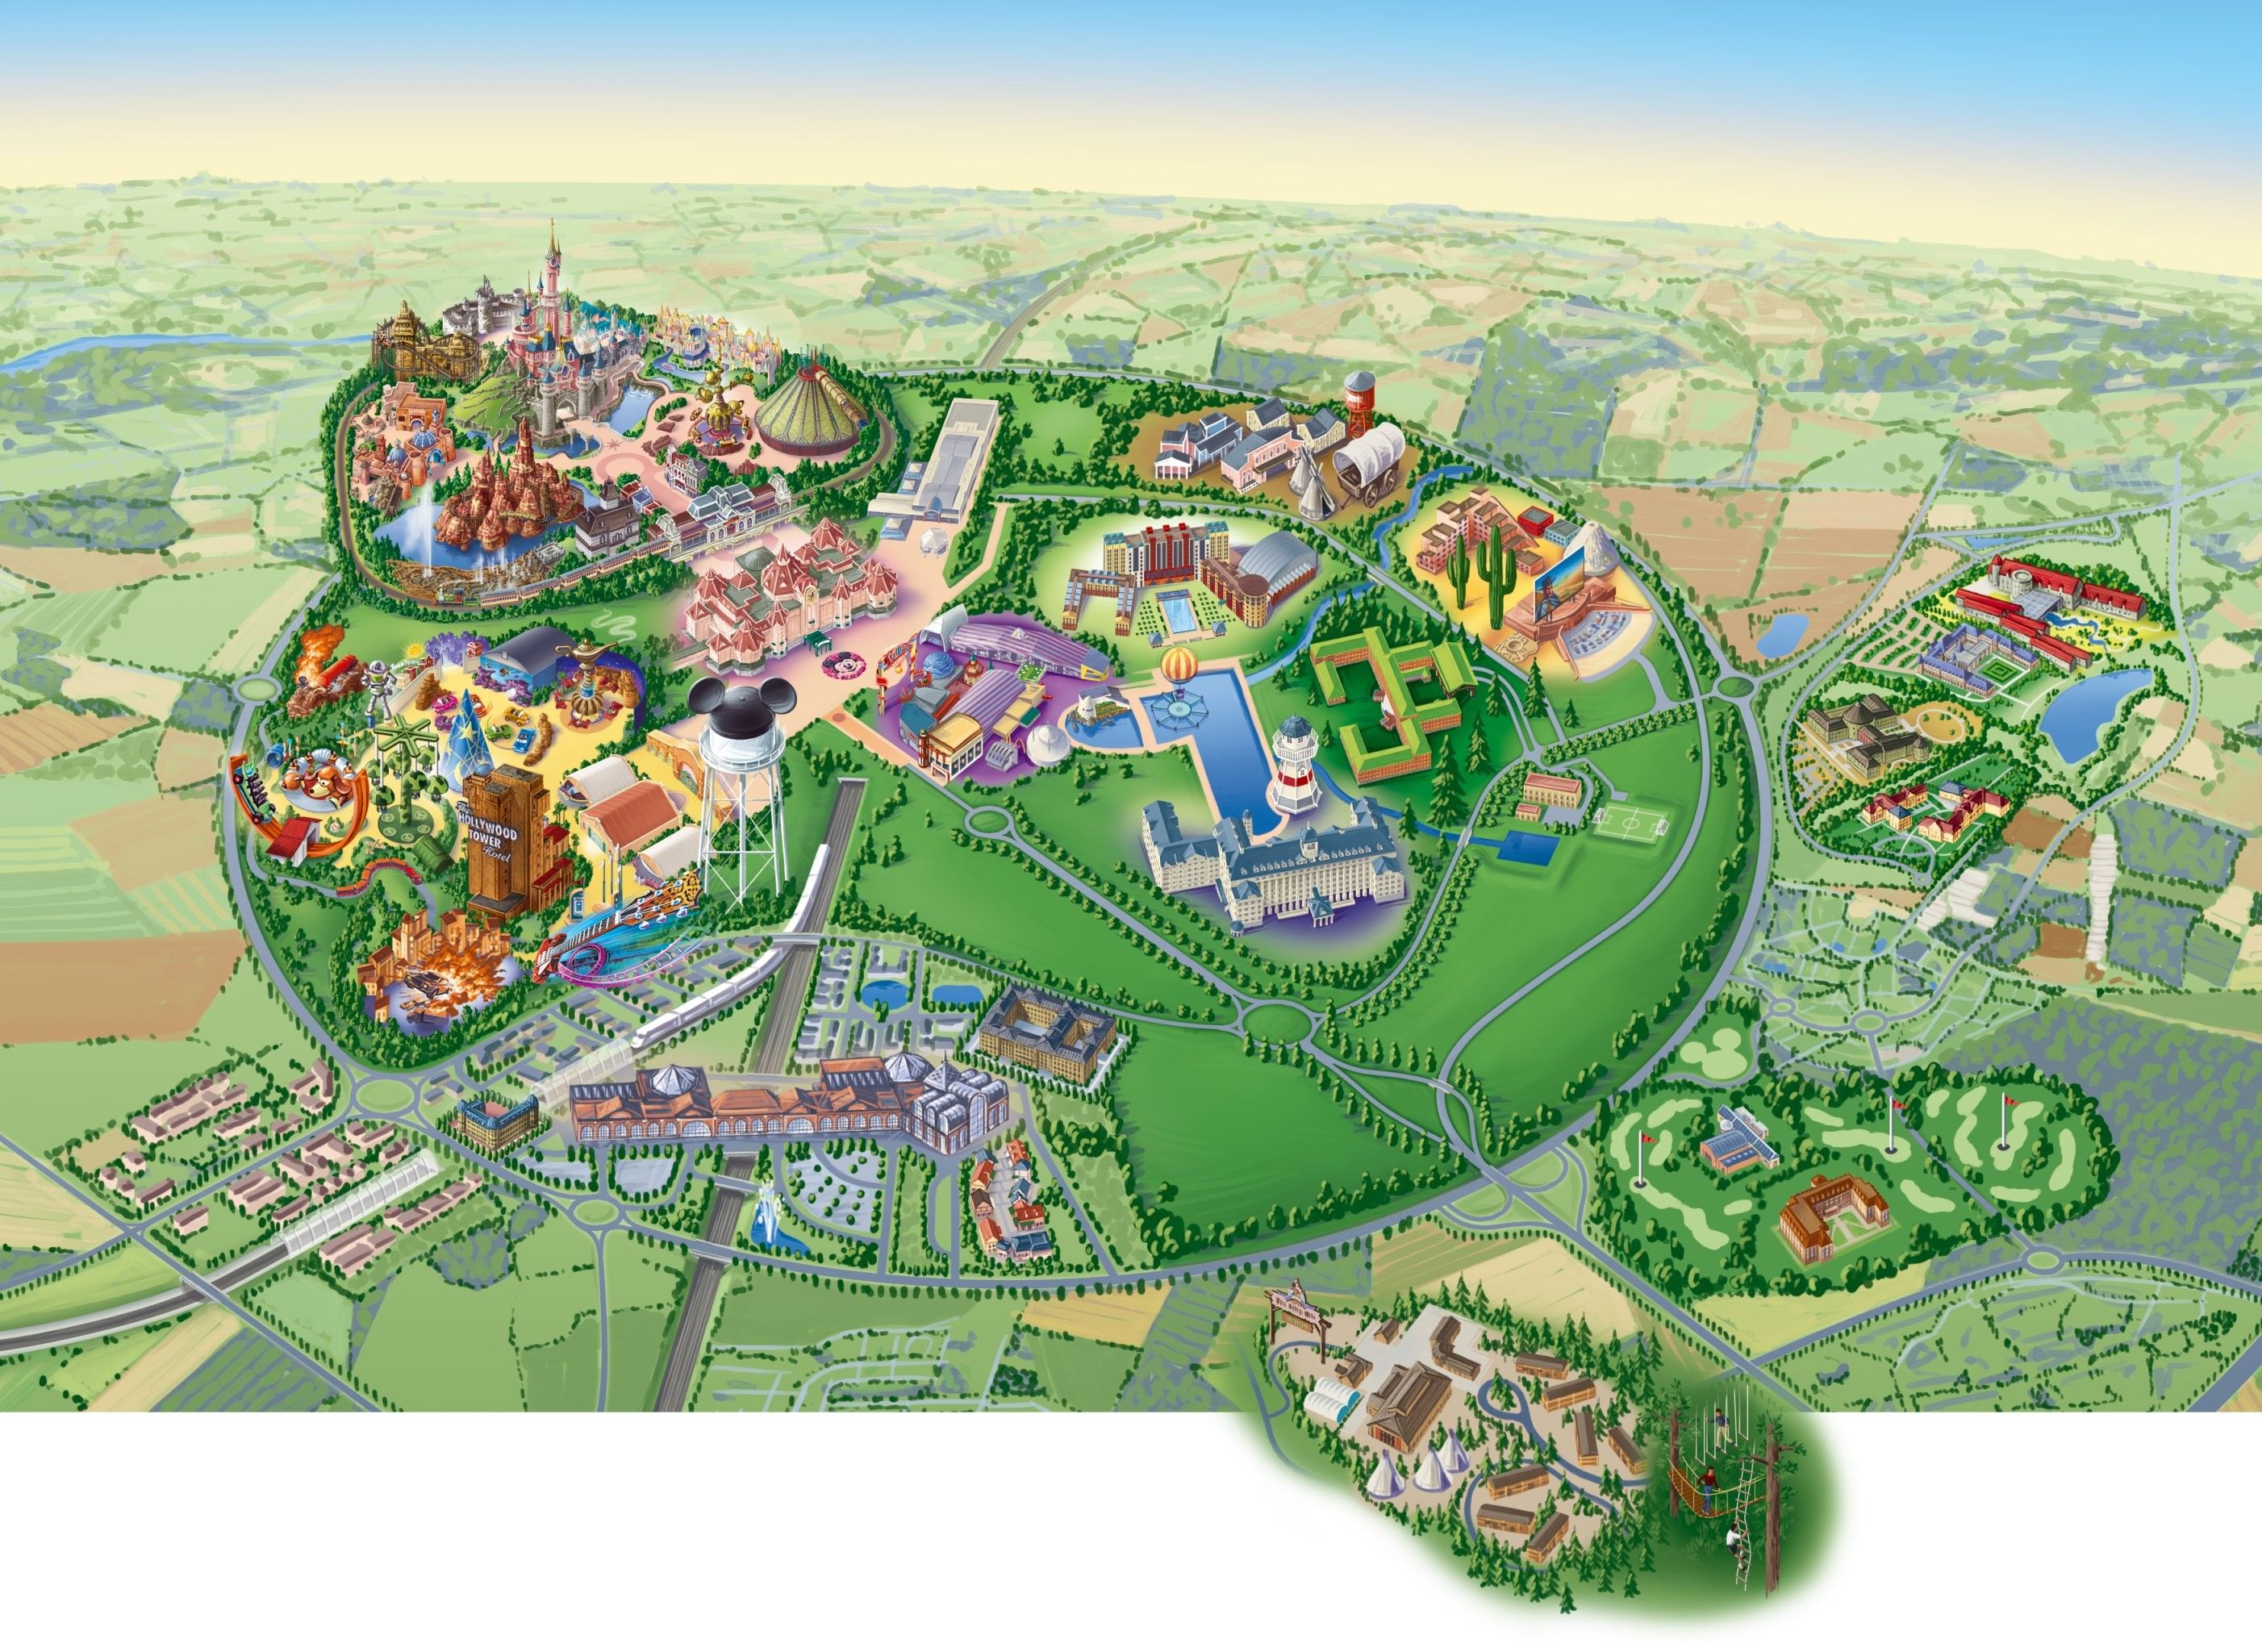 Map of the whole park Disneyland Paris